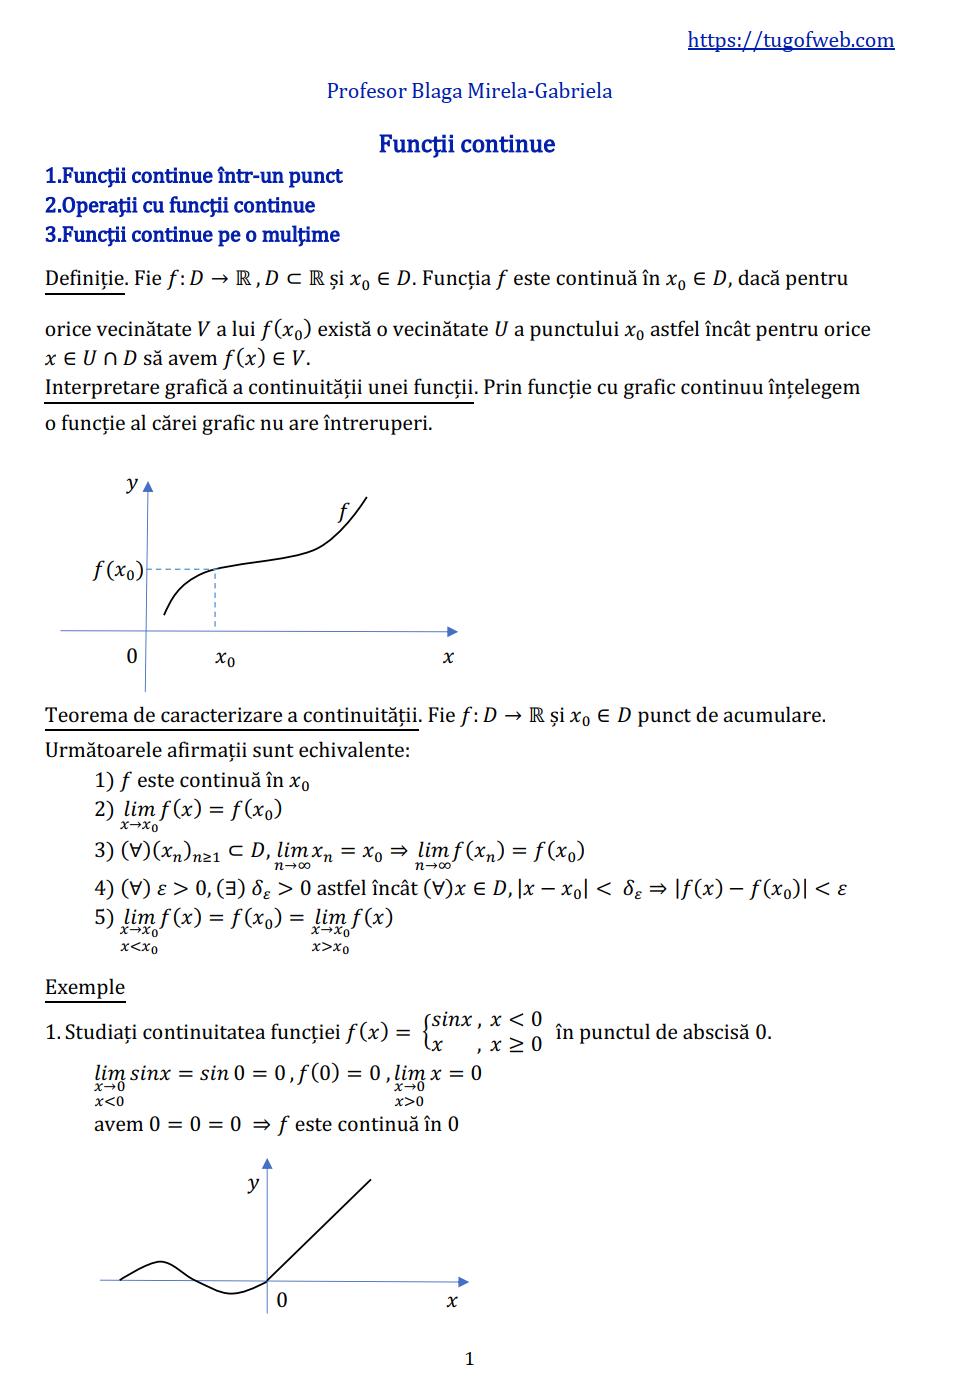 Functii_continue_teorie_exemple_Blaga